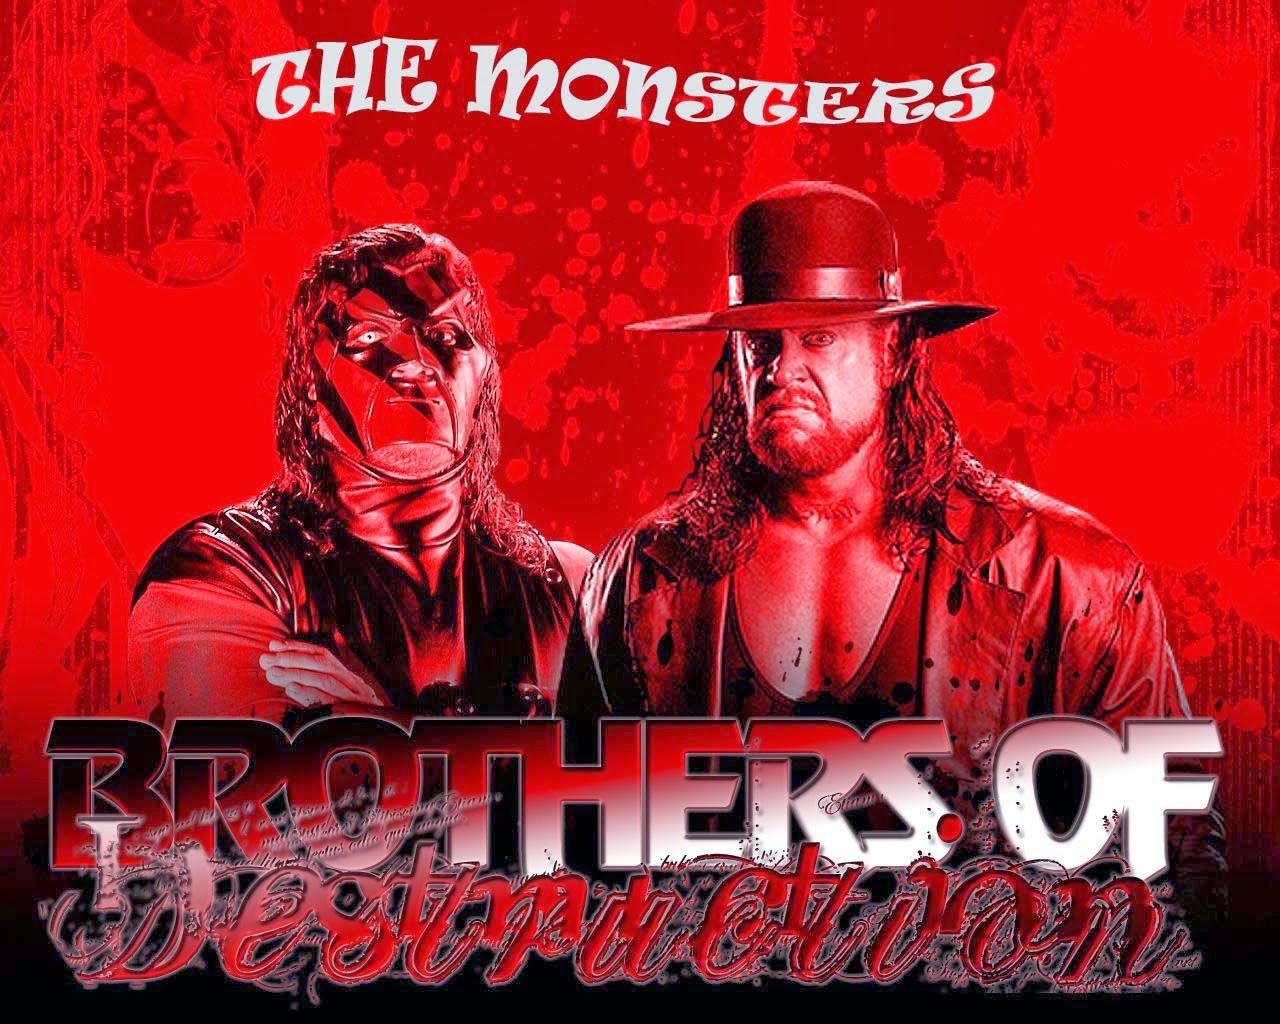 Kane Wwe Latest Hd Wallpaper 2013 14: WWE Kane Masked HD Wallpapers